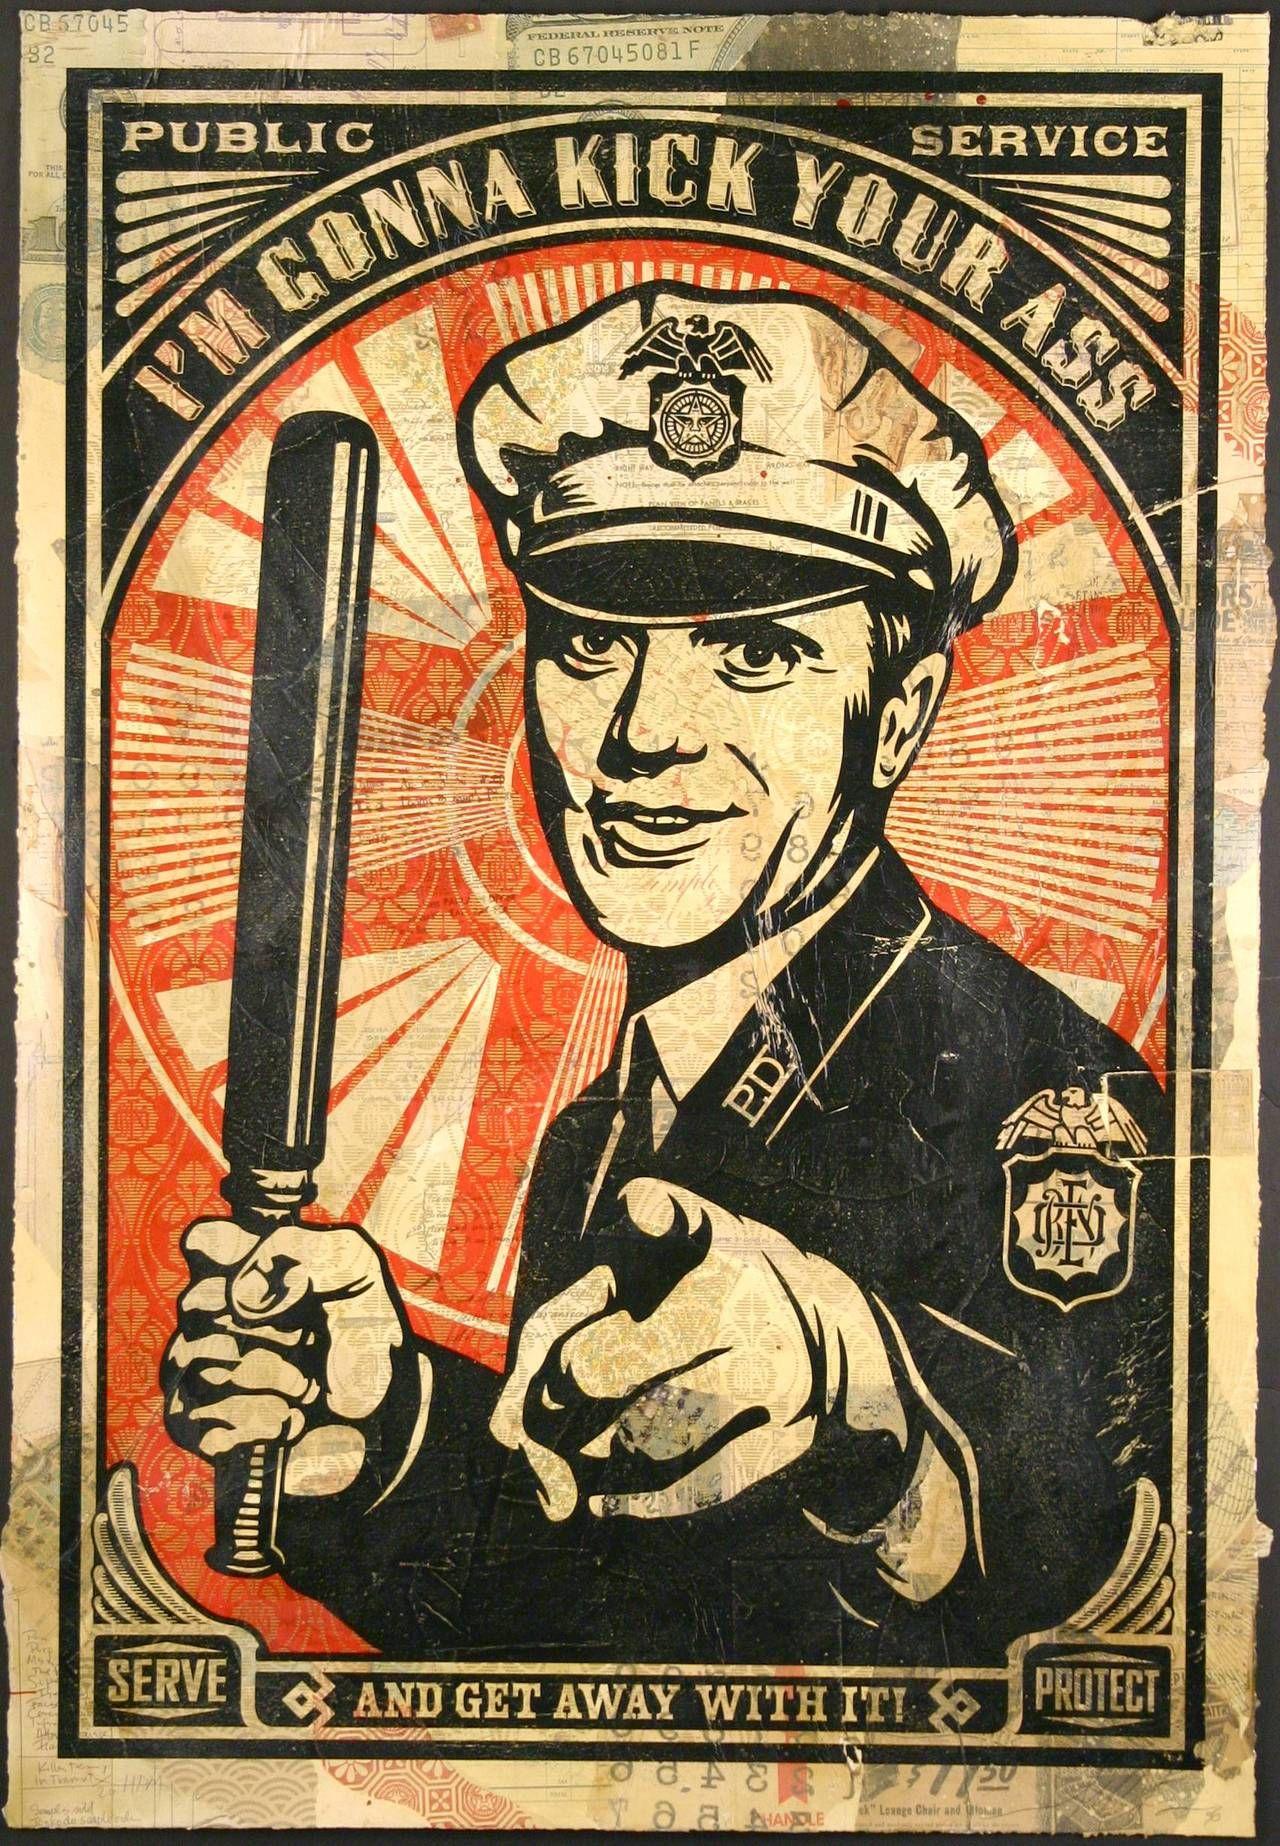 American Anti-Police Brutality Propaganda Poster